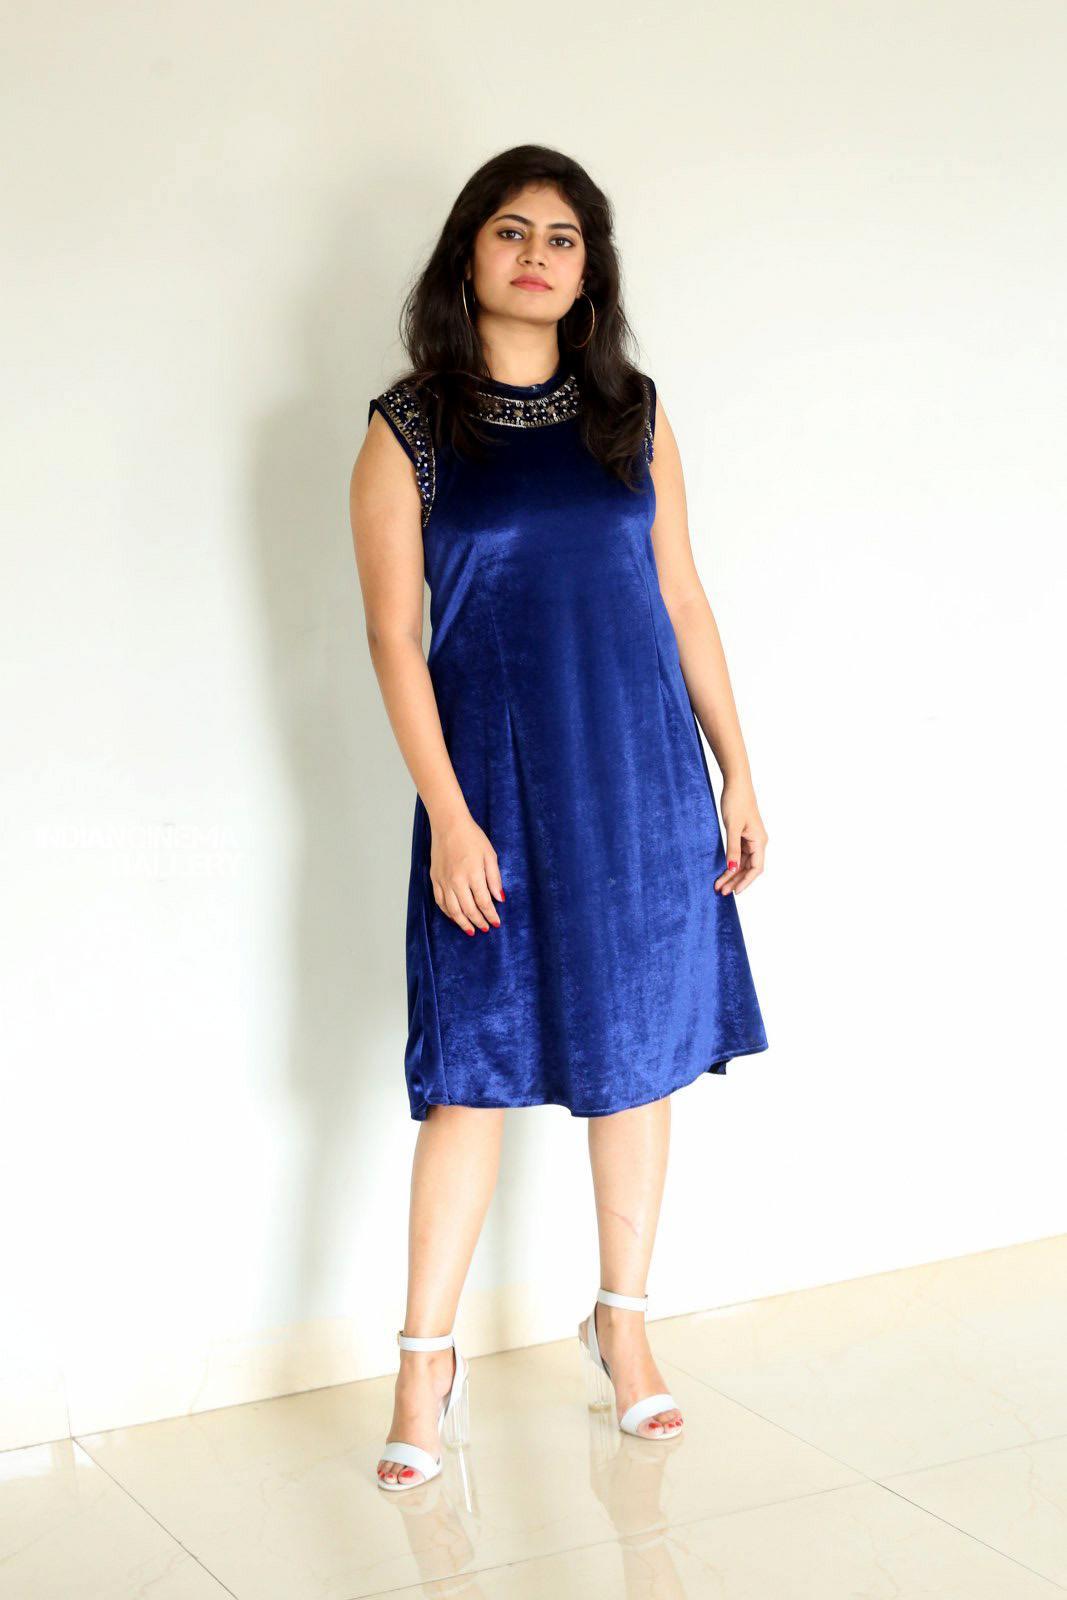 Actress Sritha Chandana Stills (8)